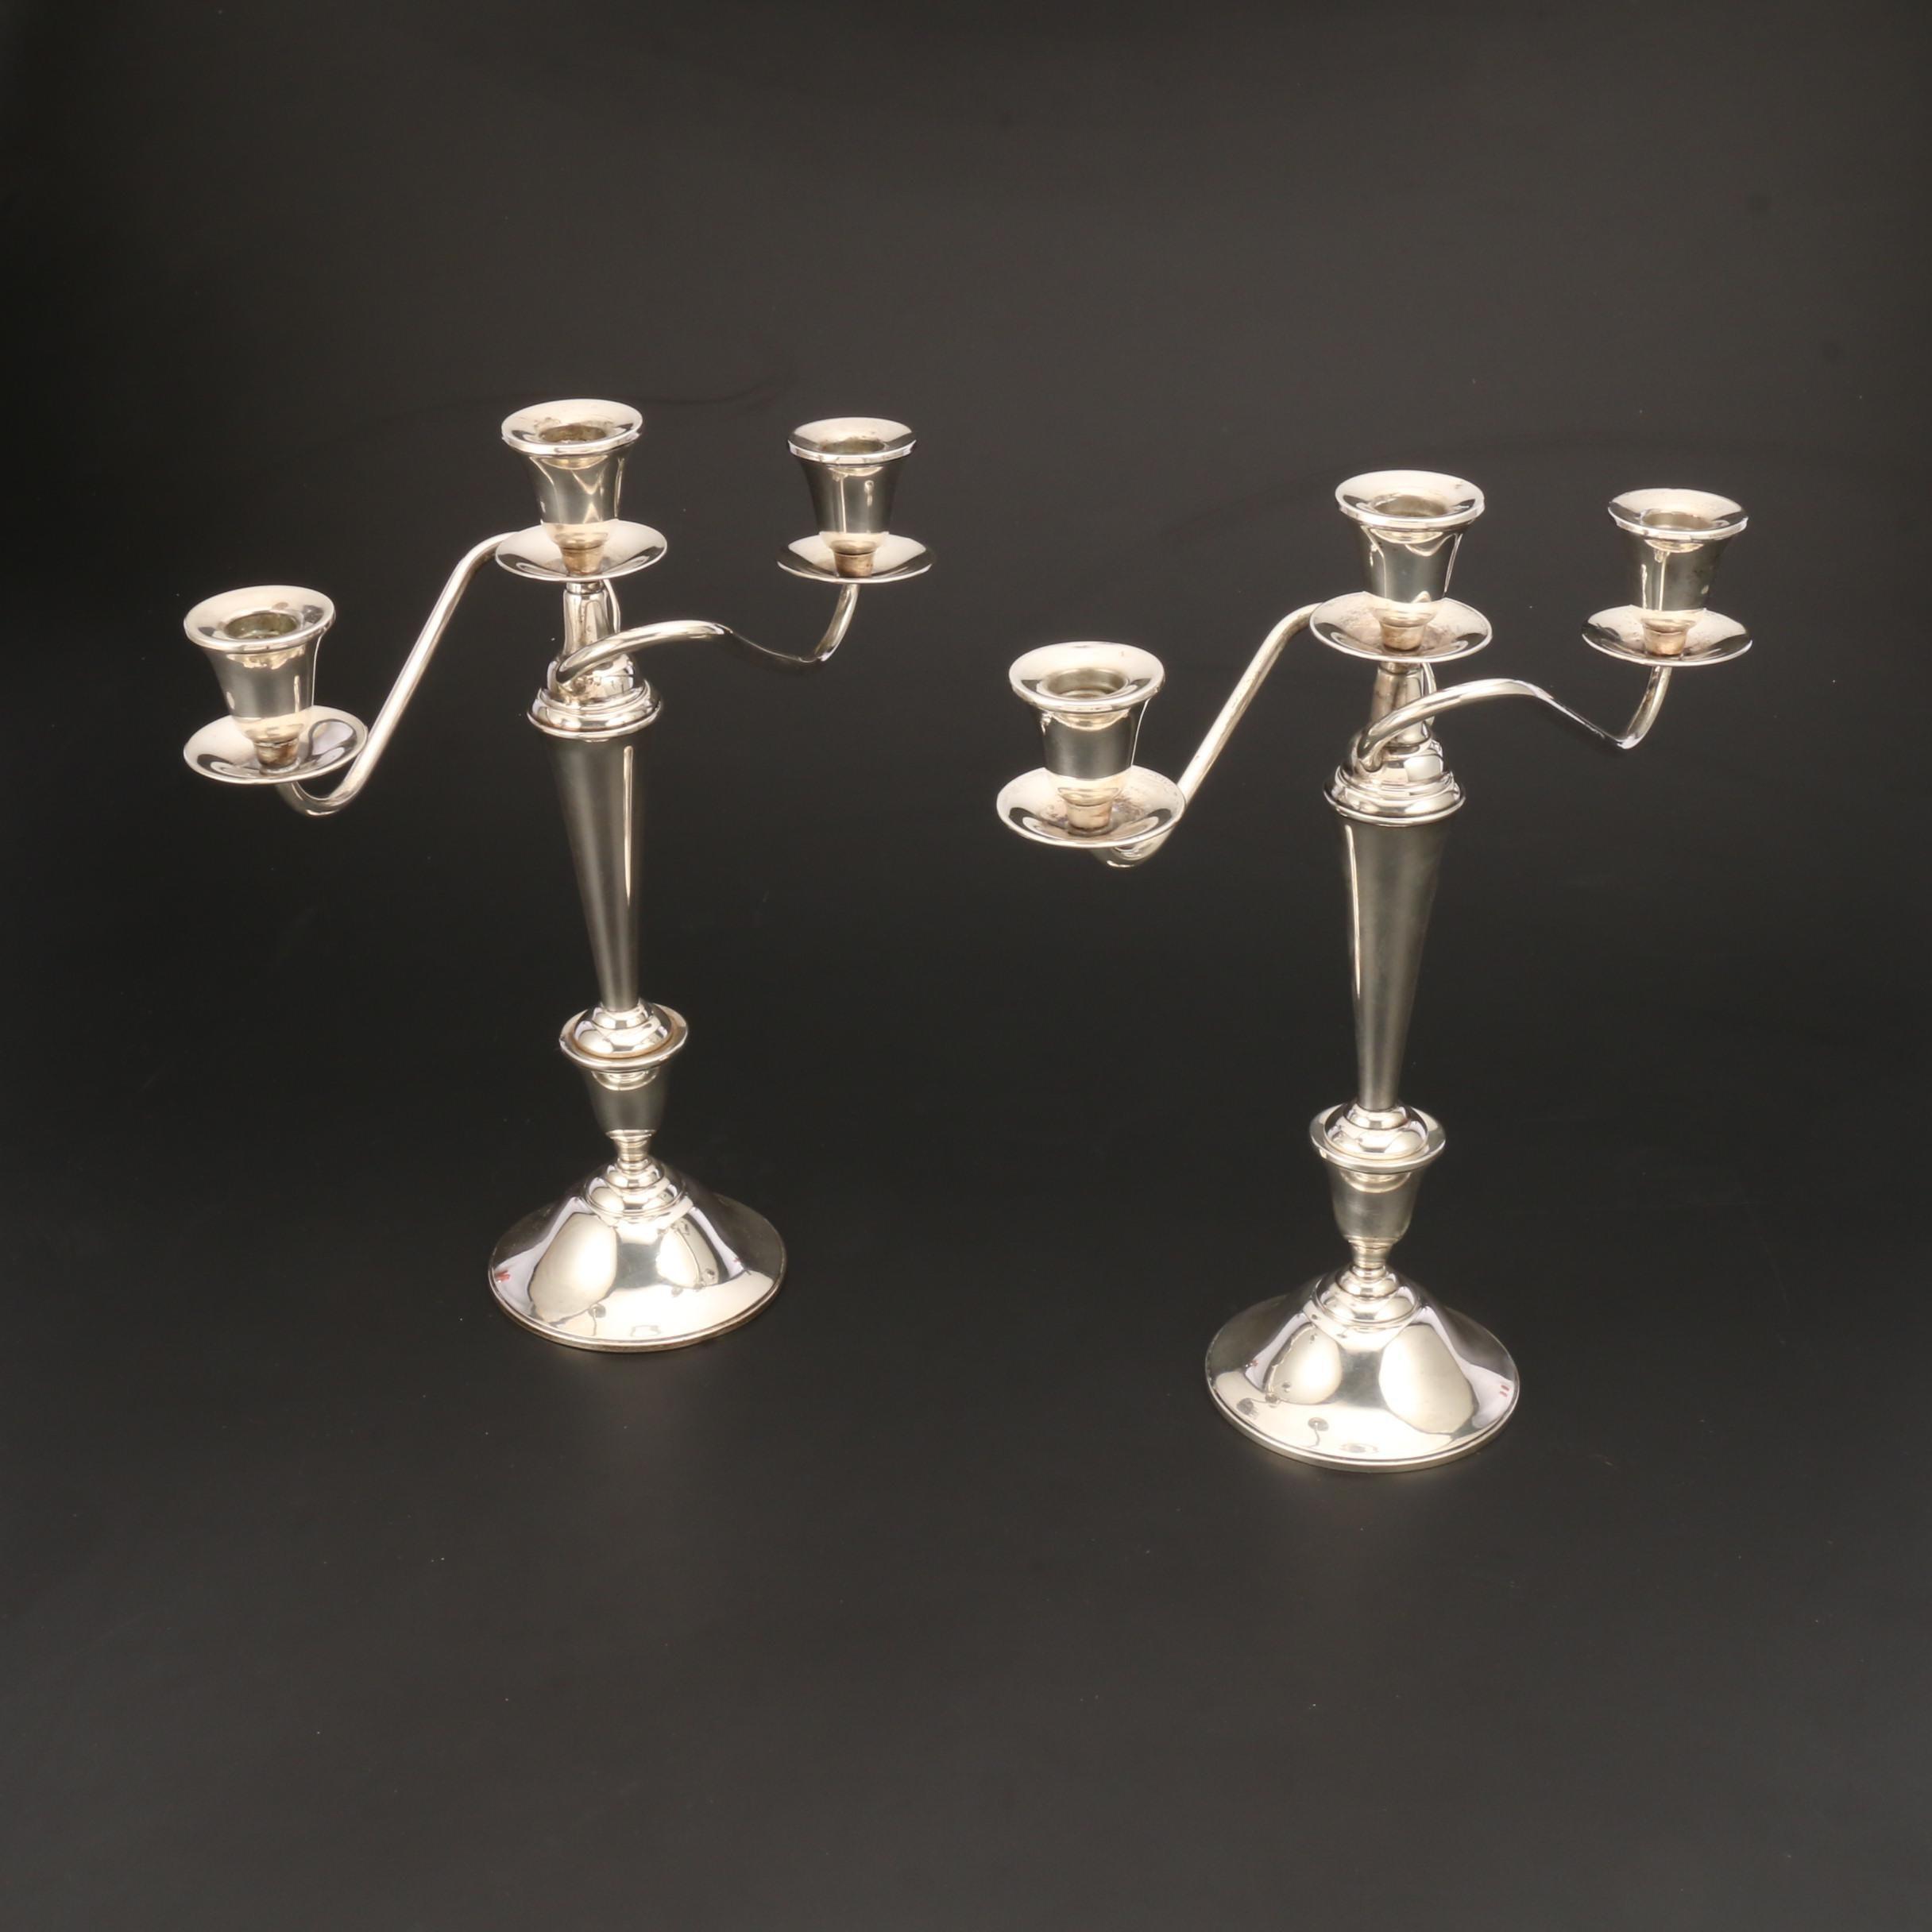 International Sterling Silver Weighted Candelabra